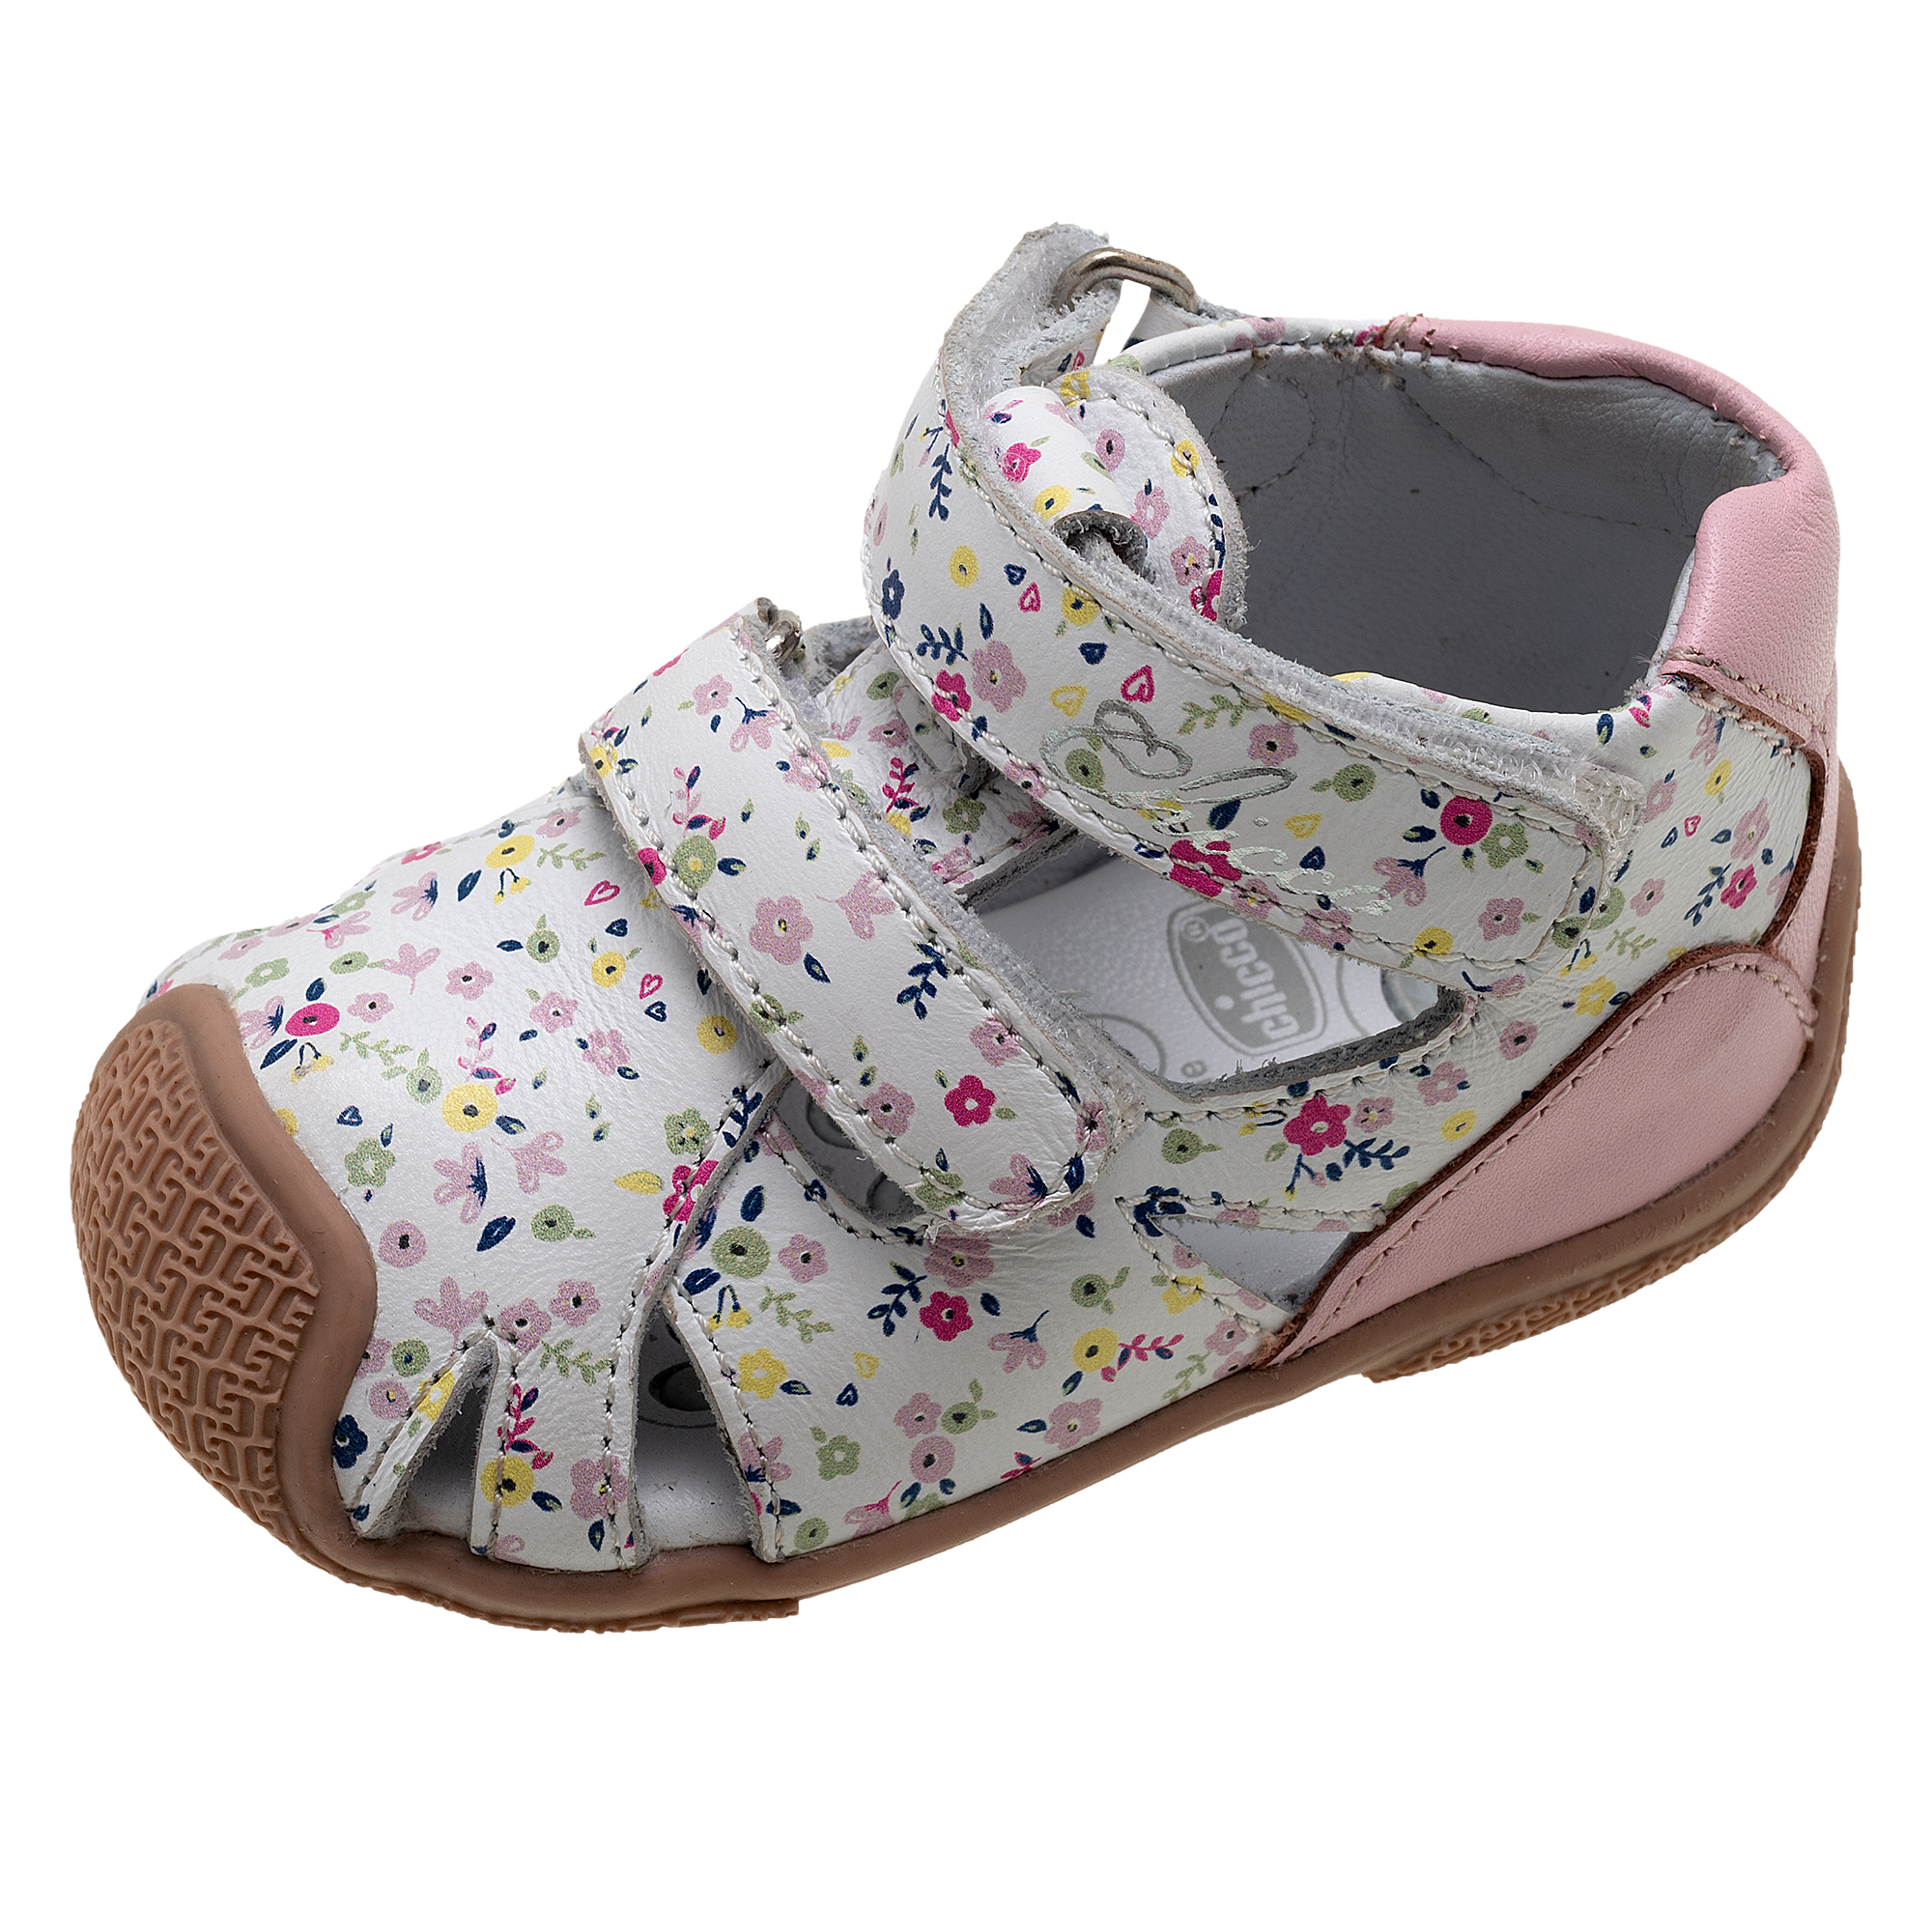 Sandalute Fete Chicco Geldin, Alb Cu Imprimeu Floral, 61473 imagine